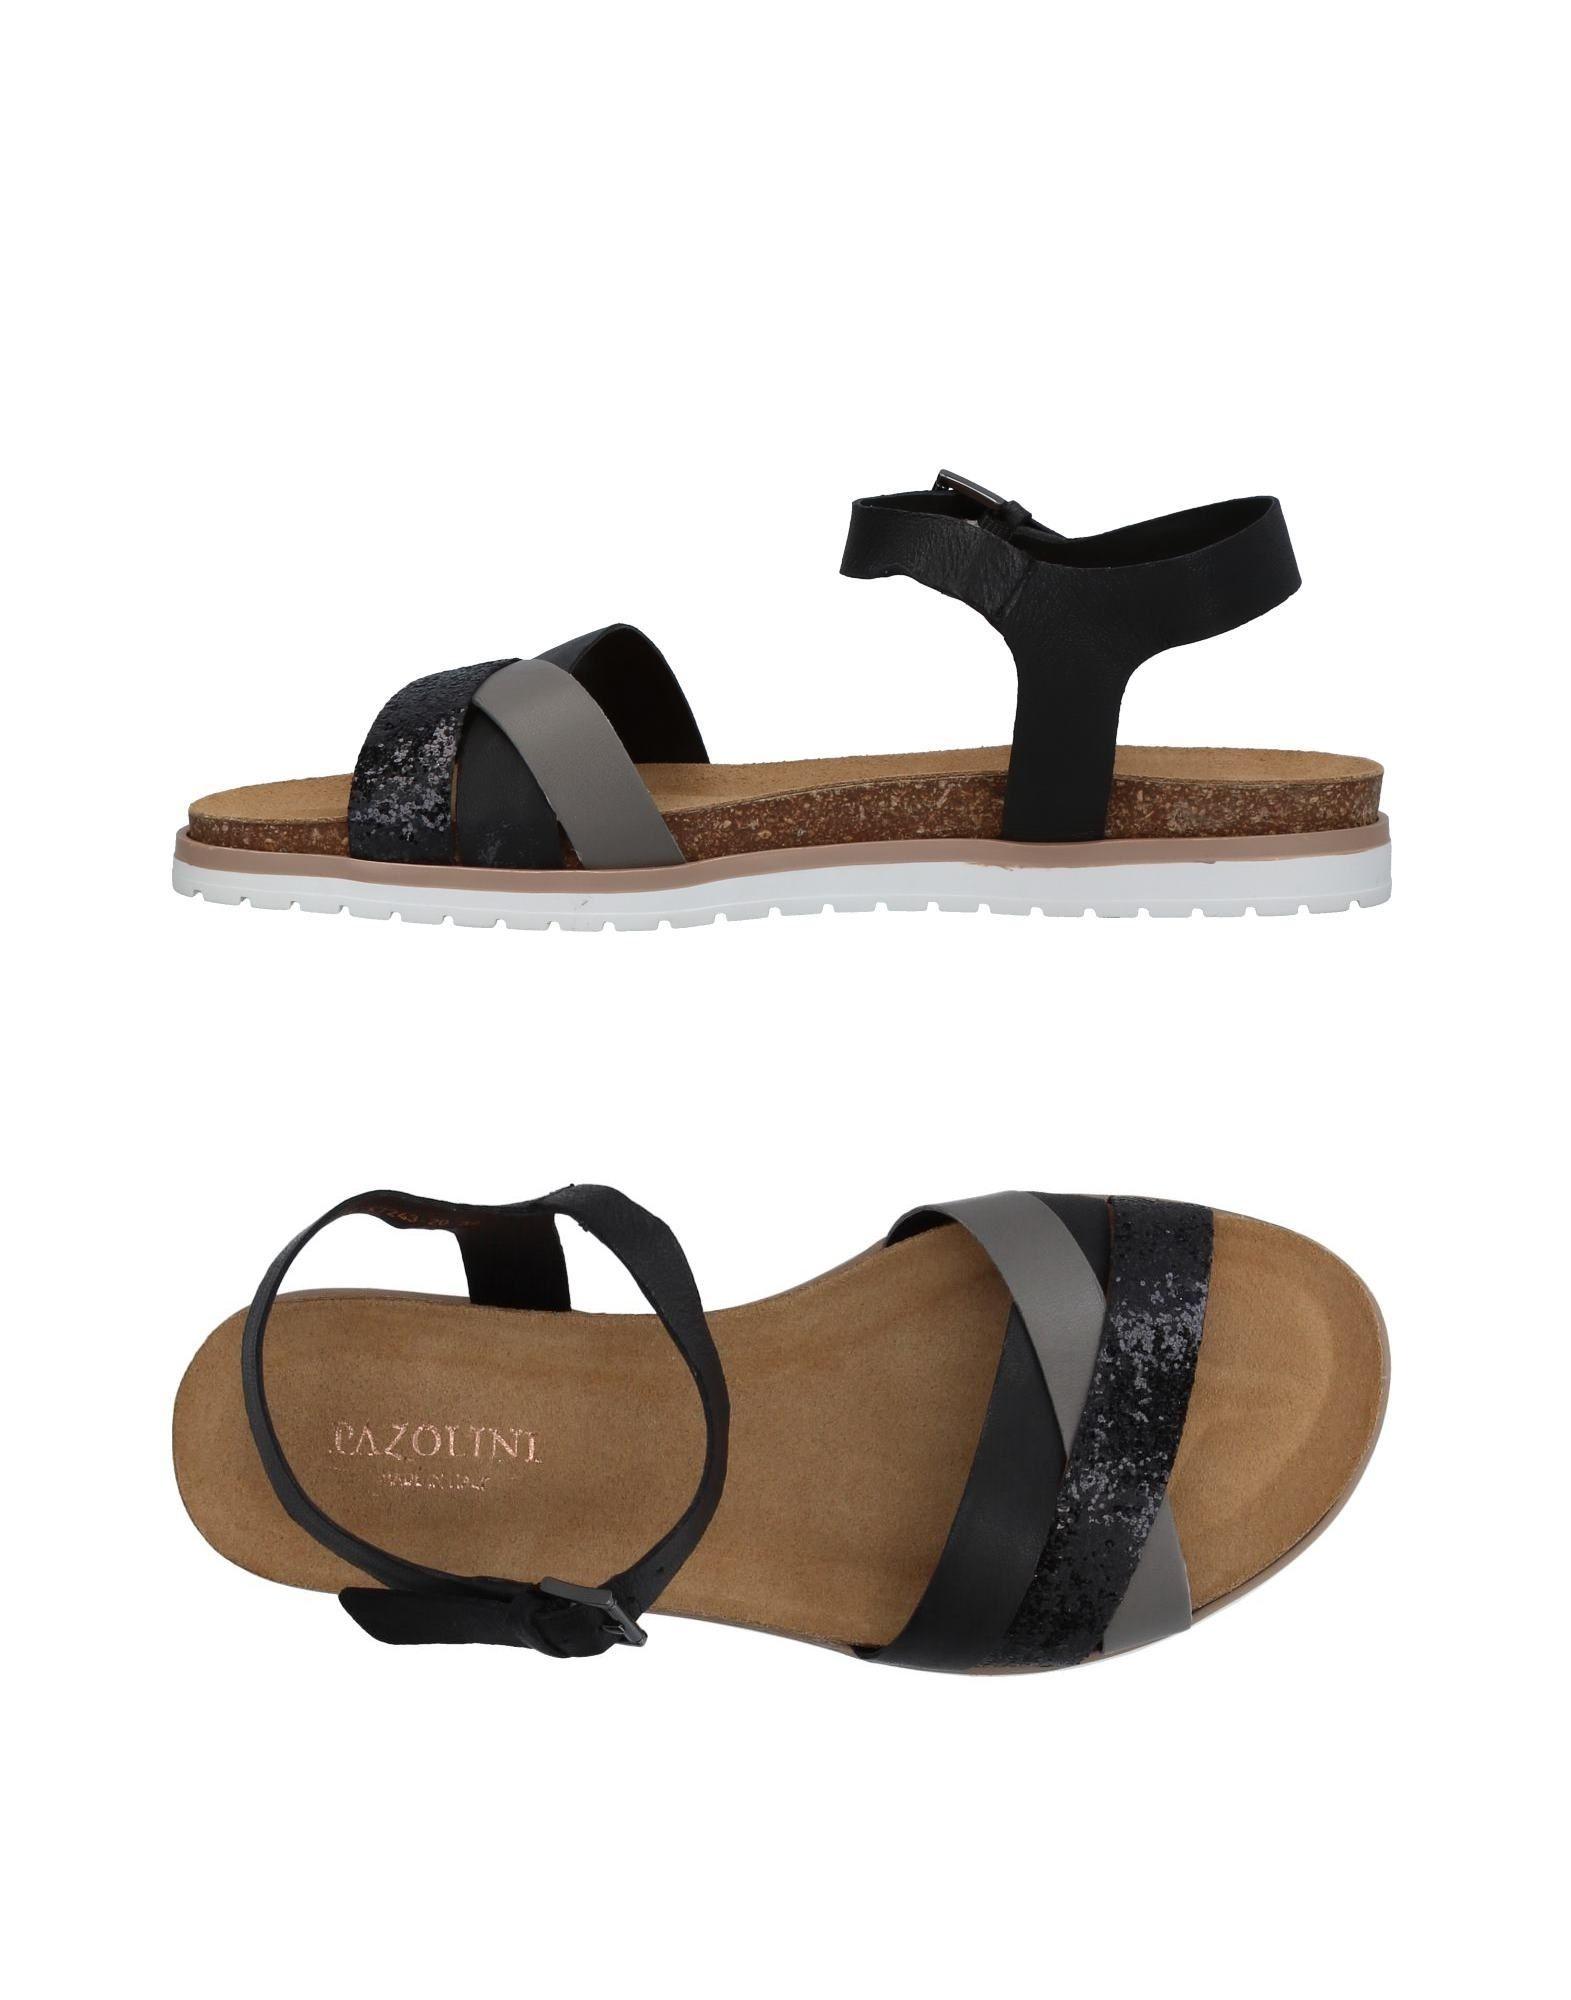 Carlo Pazolini Sandalen Damen  11407496JH Gute Qualität beliebte Schuhe